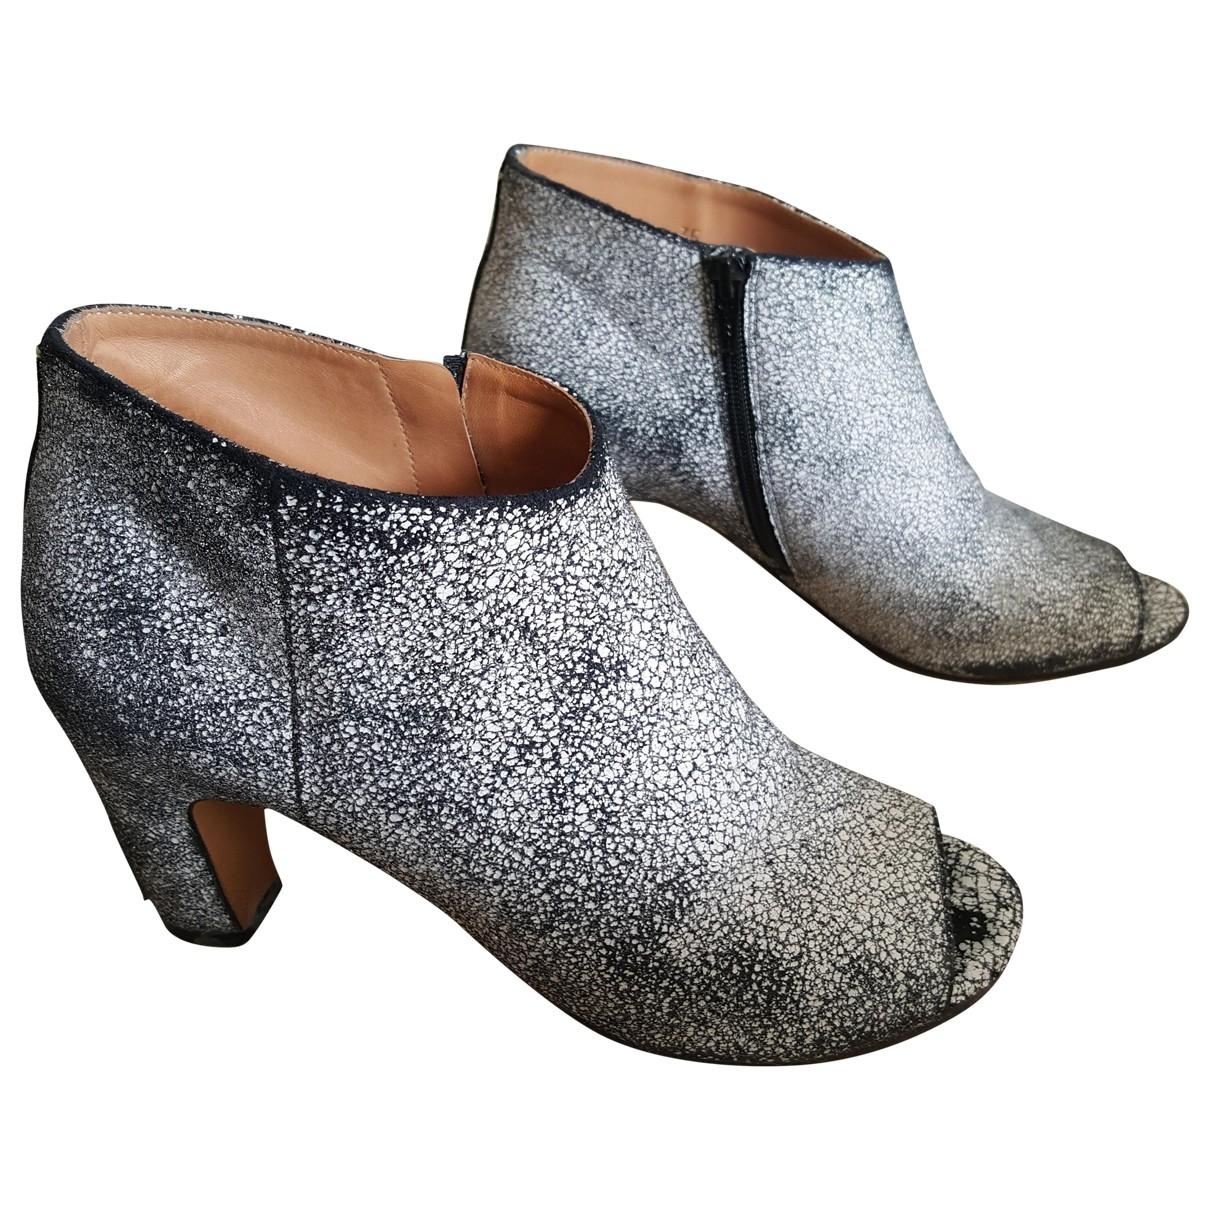 Maison Martin Margiela \N Grey Suede Ankle boots for Women 35 EU